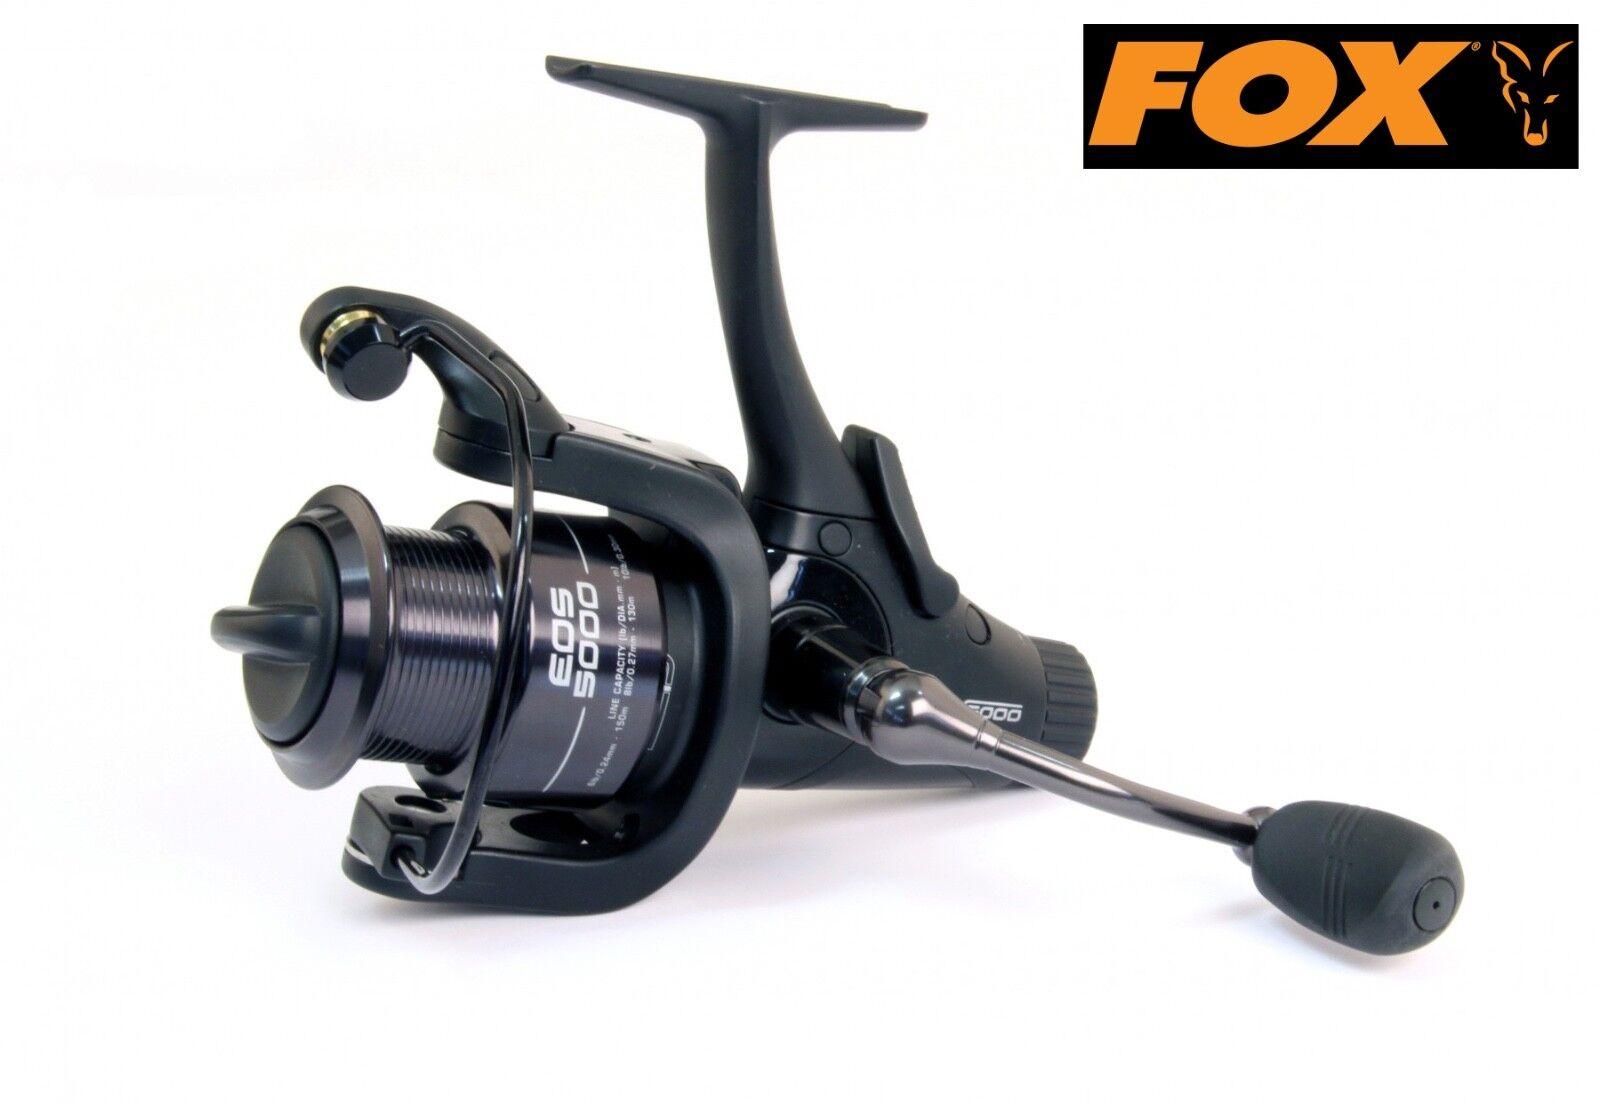 FOX EOS 5000 Reel-CRL062. free spool Freespool. + Nuovo di Zecca GRATIS P&P